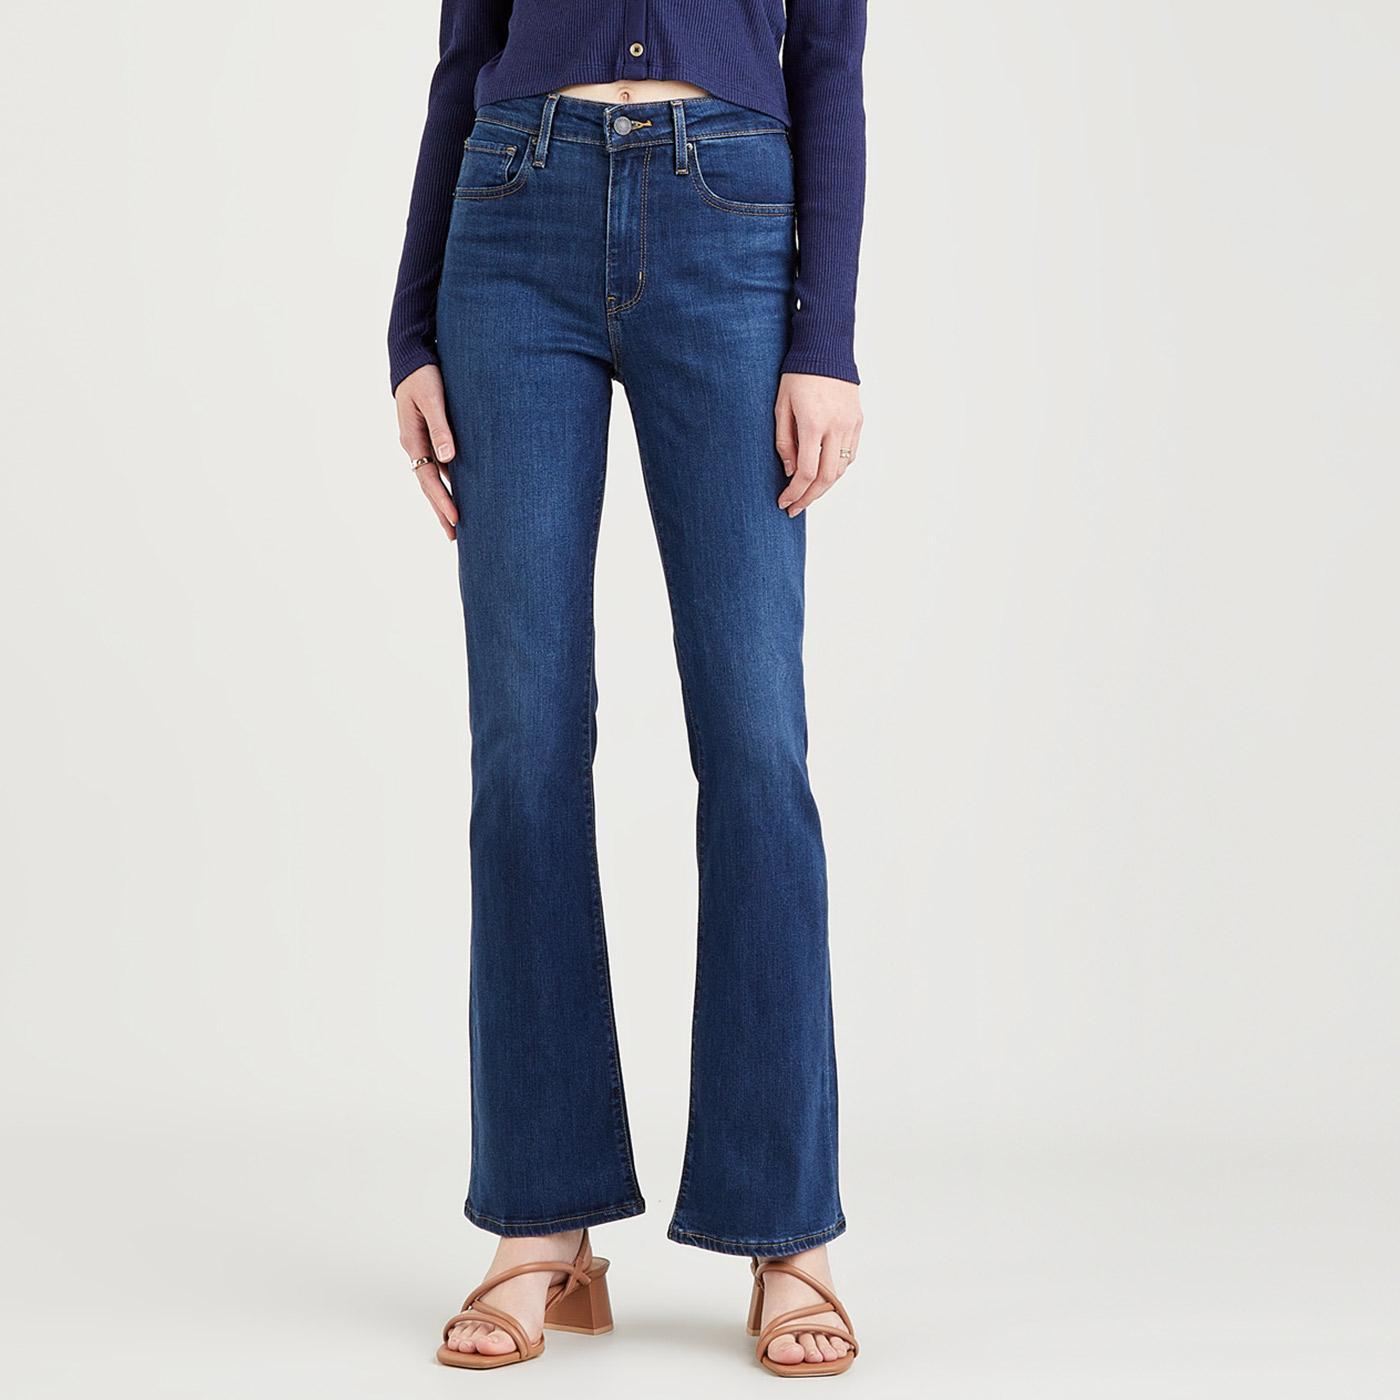 LEVI'S 725 High Waist Bootcut Jeans BOGOTA Shake